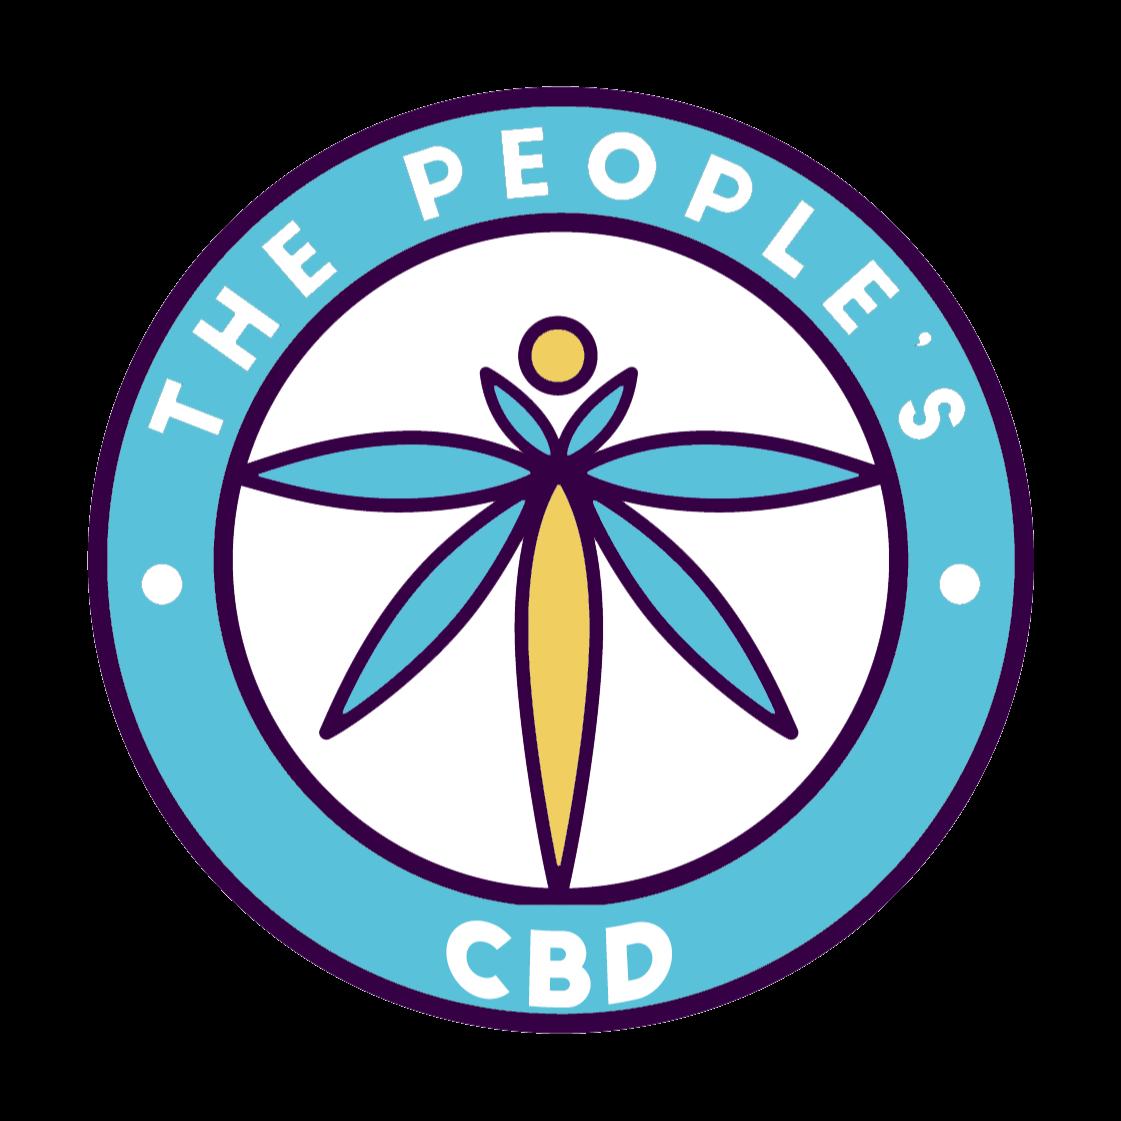 The People's CBD